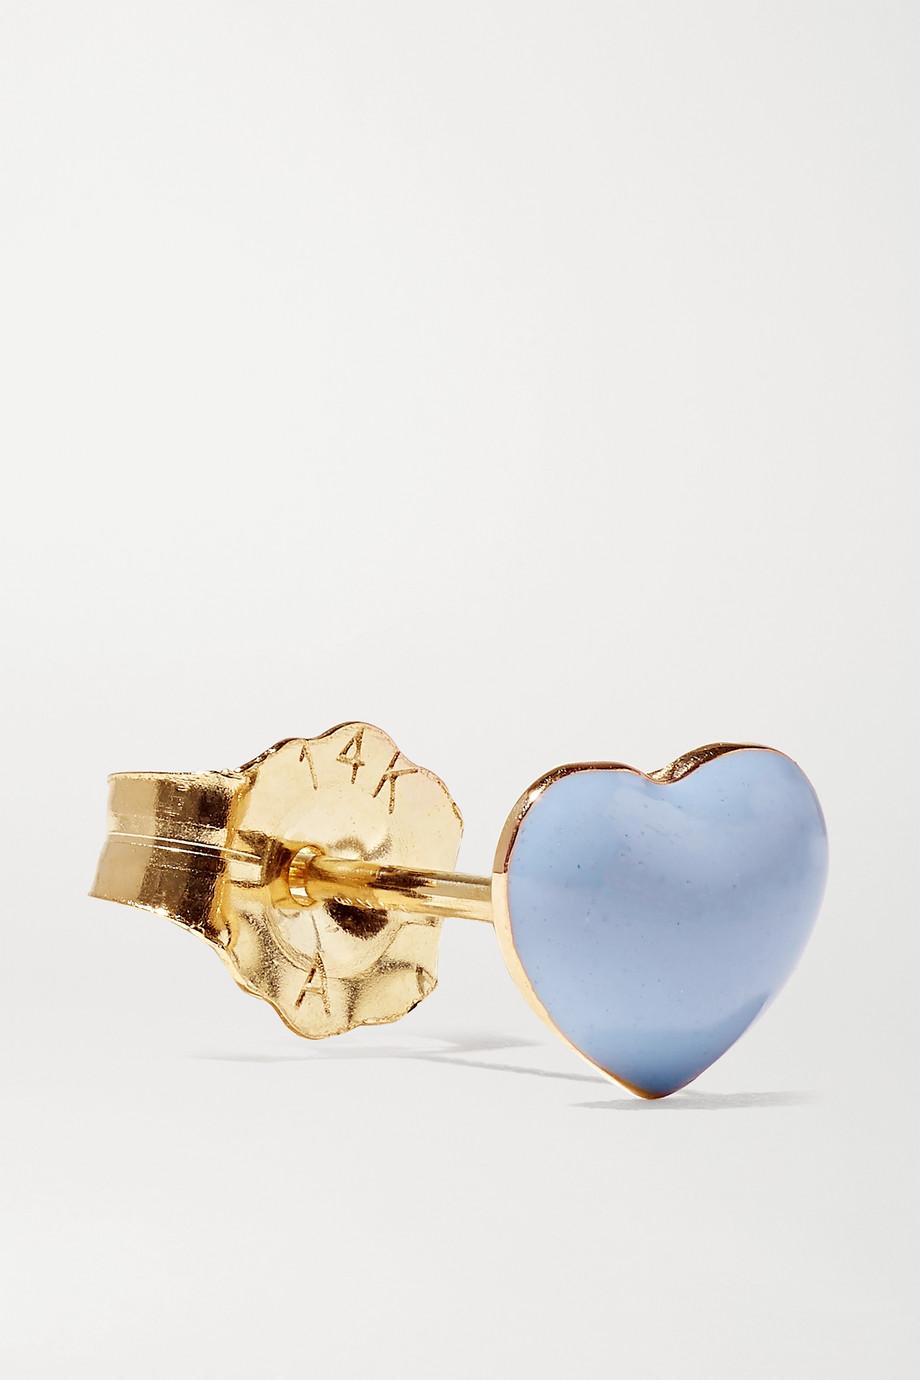 Alison Lou Mini Puffy Heart Ohrring aus 14 Karat Gold mit Emaille